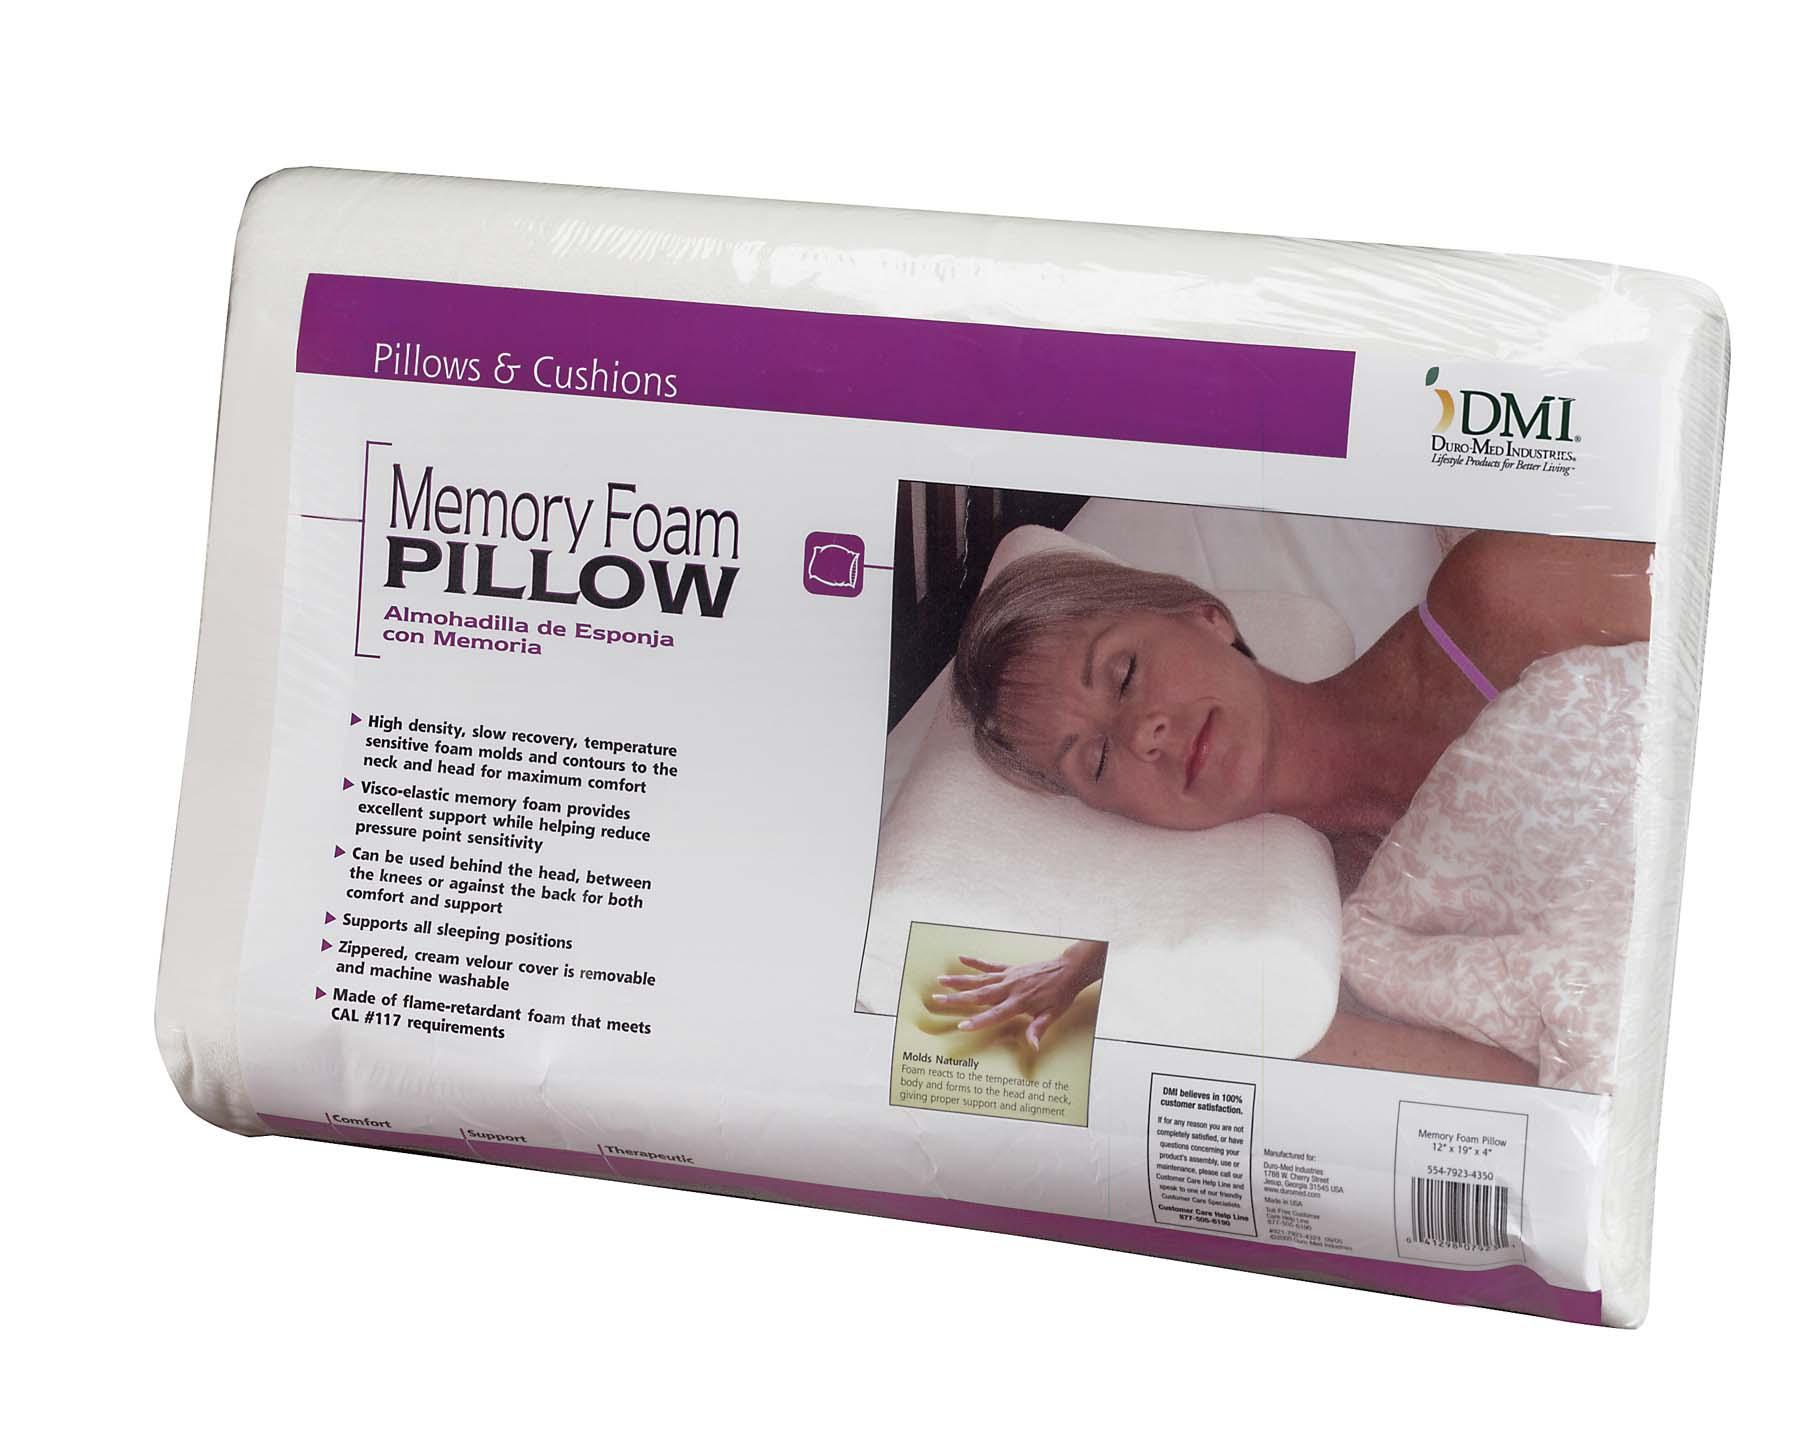 large-memory-foam-pillow-554-7923-4323-lr.jpg